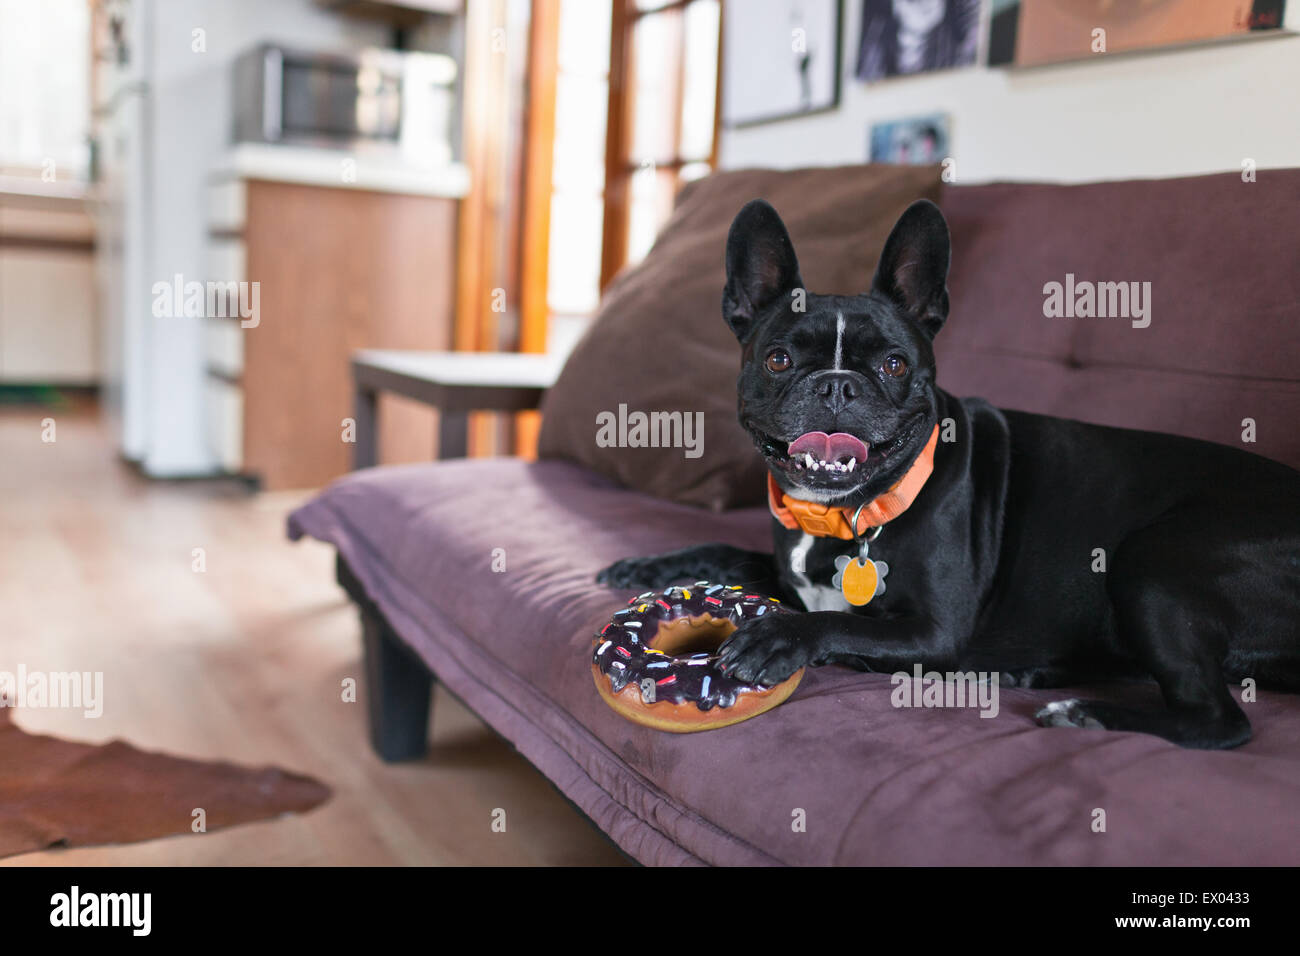 Porträt des Hundes auf Sofa Donut Spielzeug festhalten Stockbild